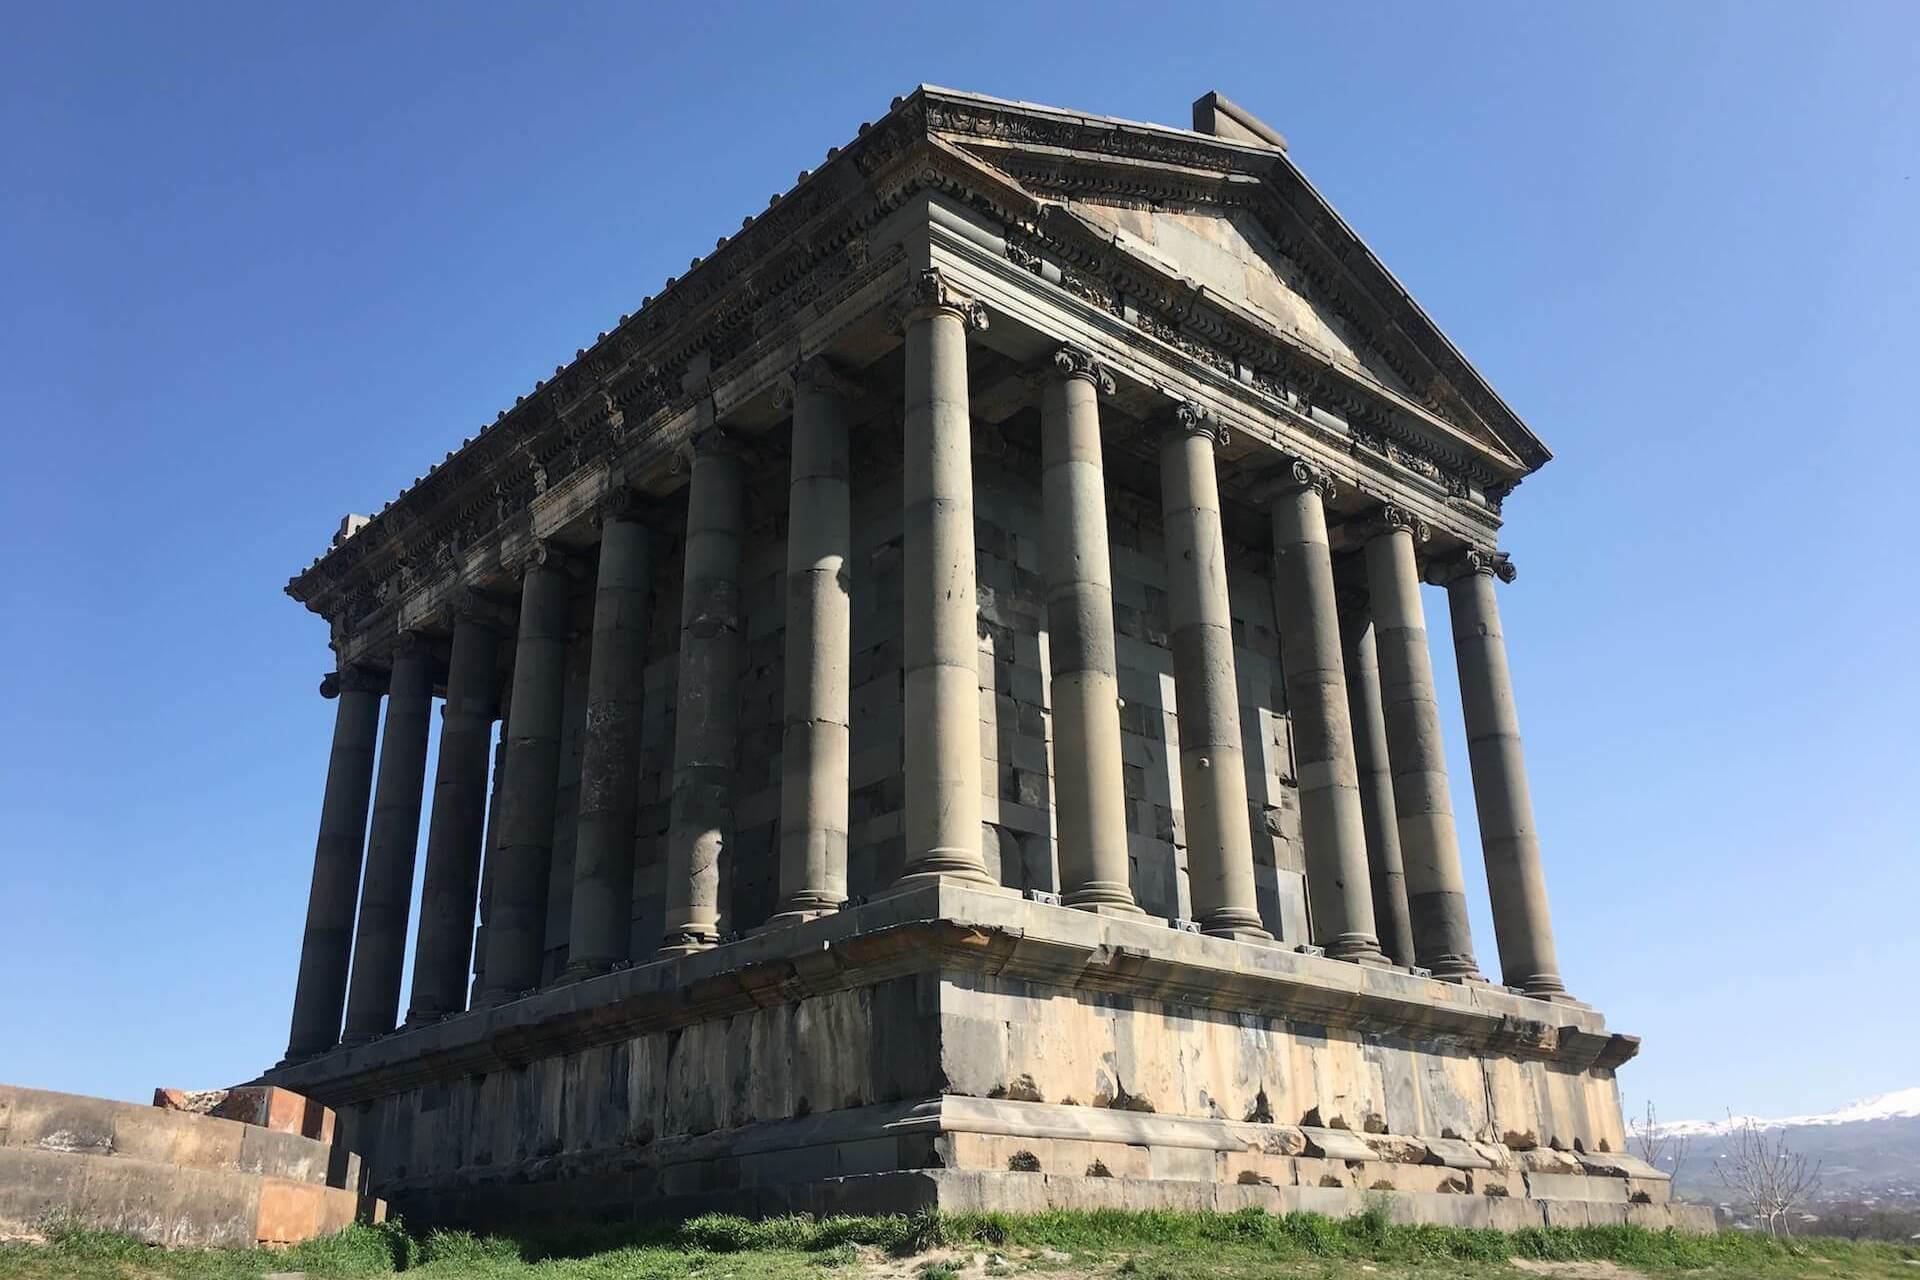 De heidense Tempel van Garni in Armenië